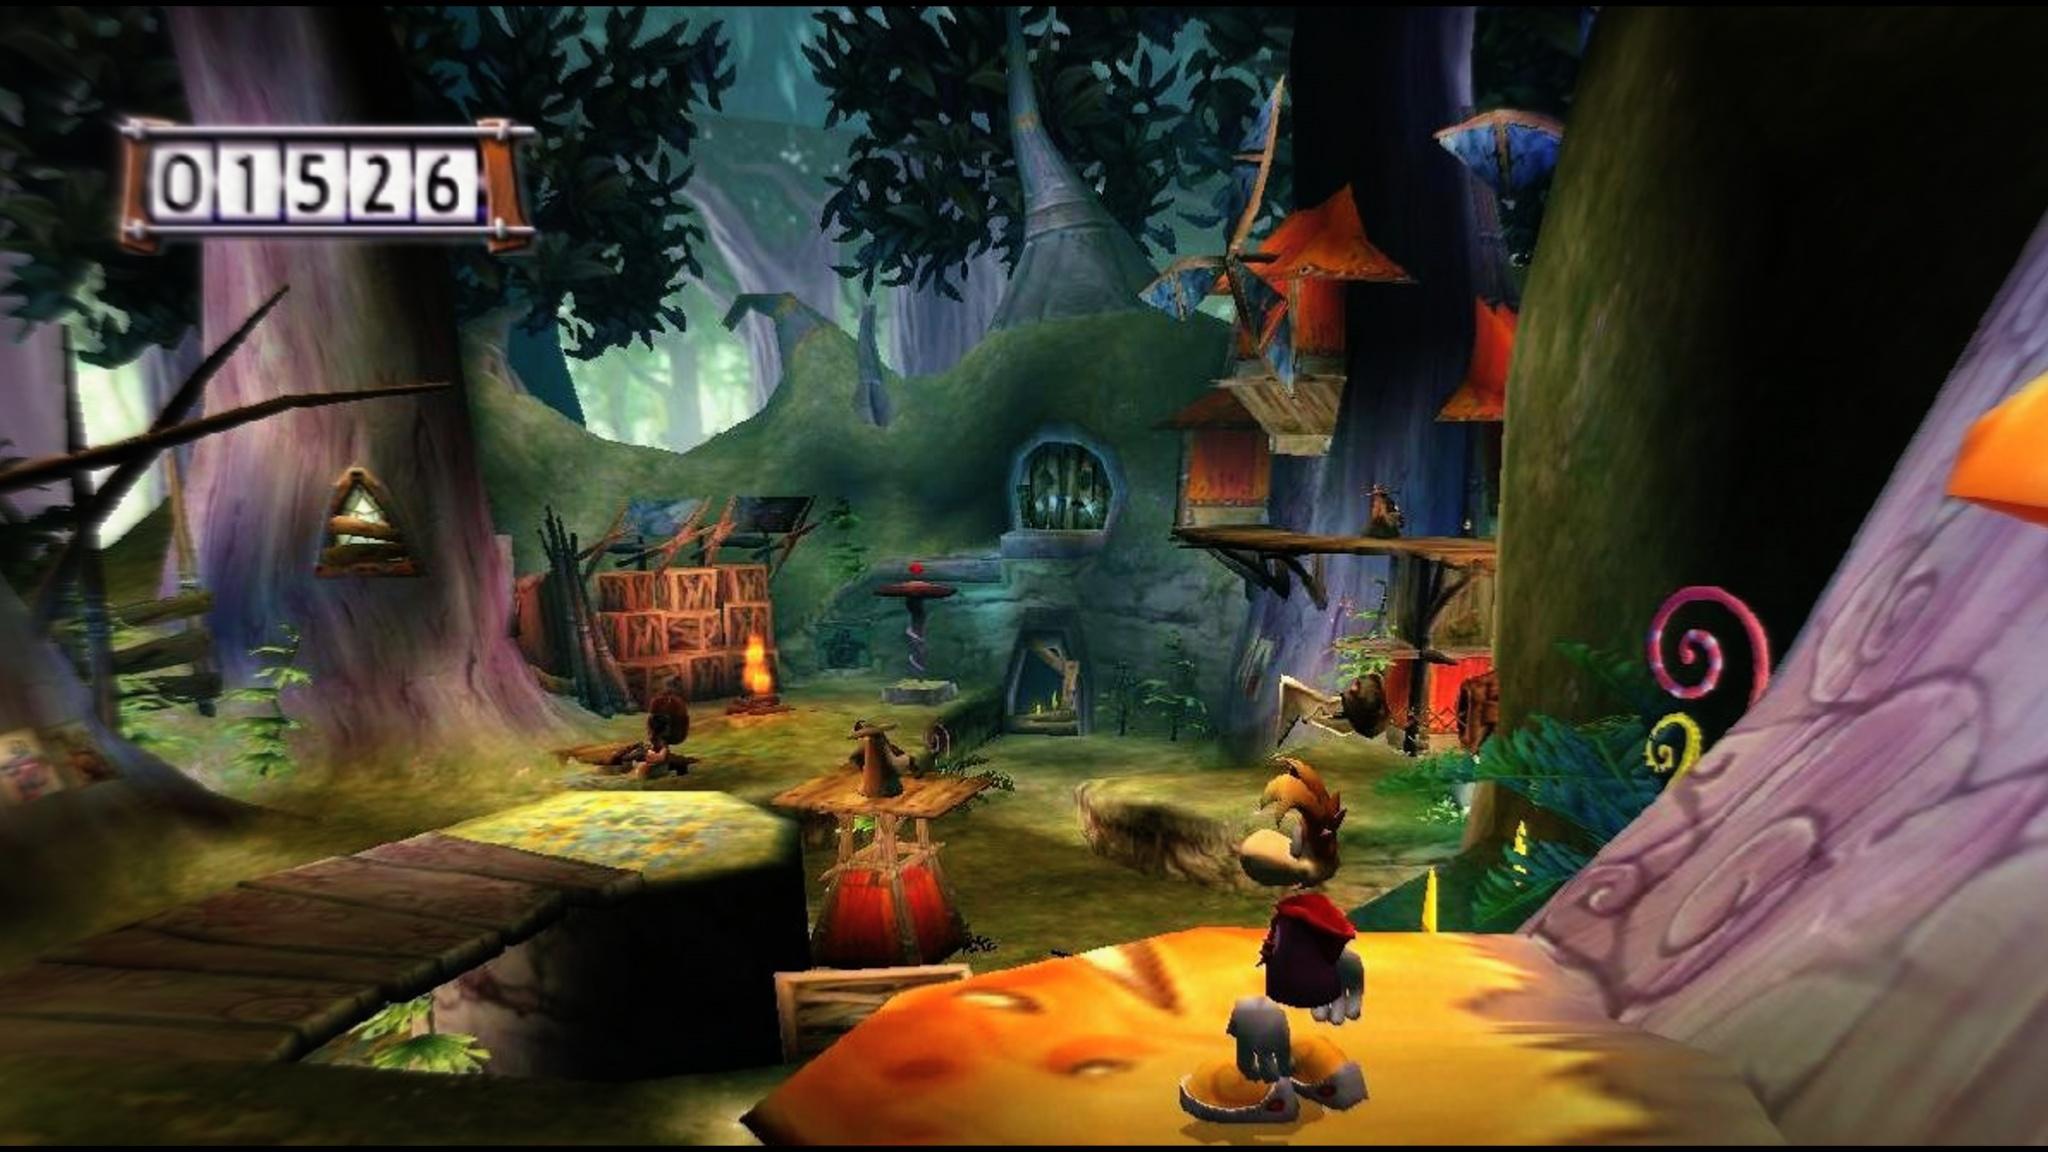 Latest 3d Live Wallpaper Rayman 3 Image Thib7861 Mod Db